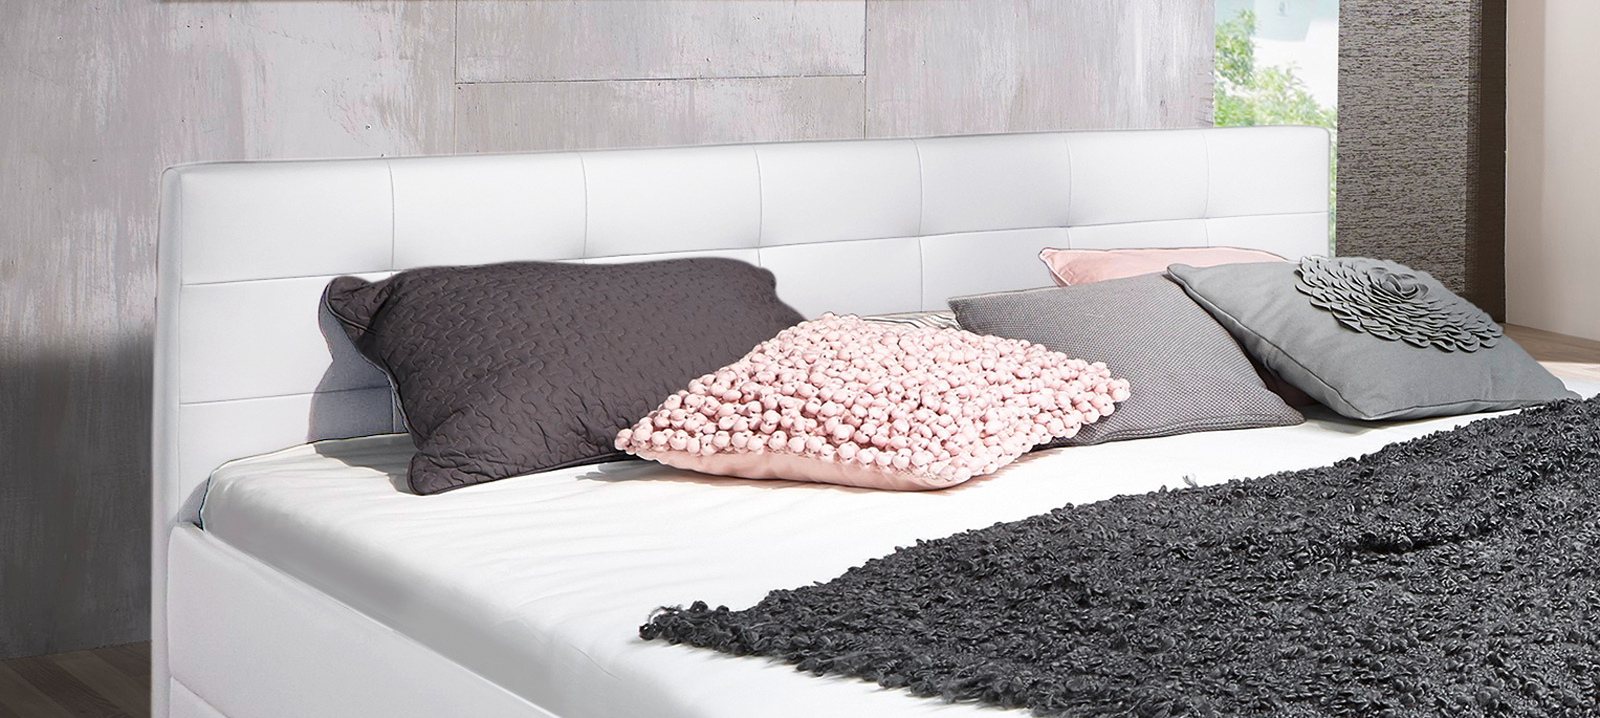 sam design boxspringbett 140 x 200 cm wei kappa. Black Bedroom Furniture Sets. Home Design Ideas